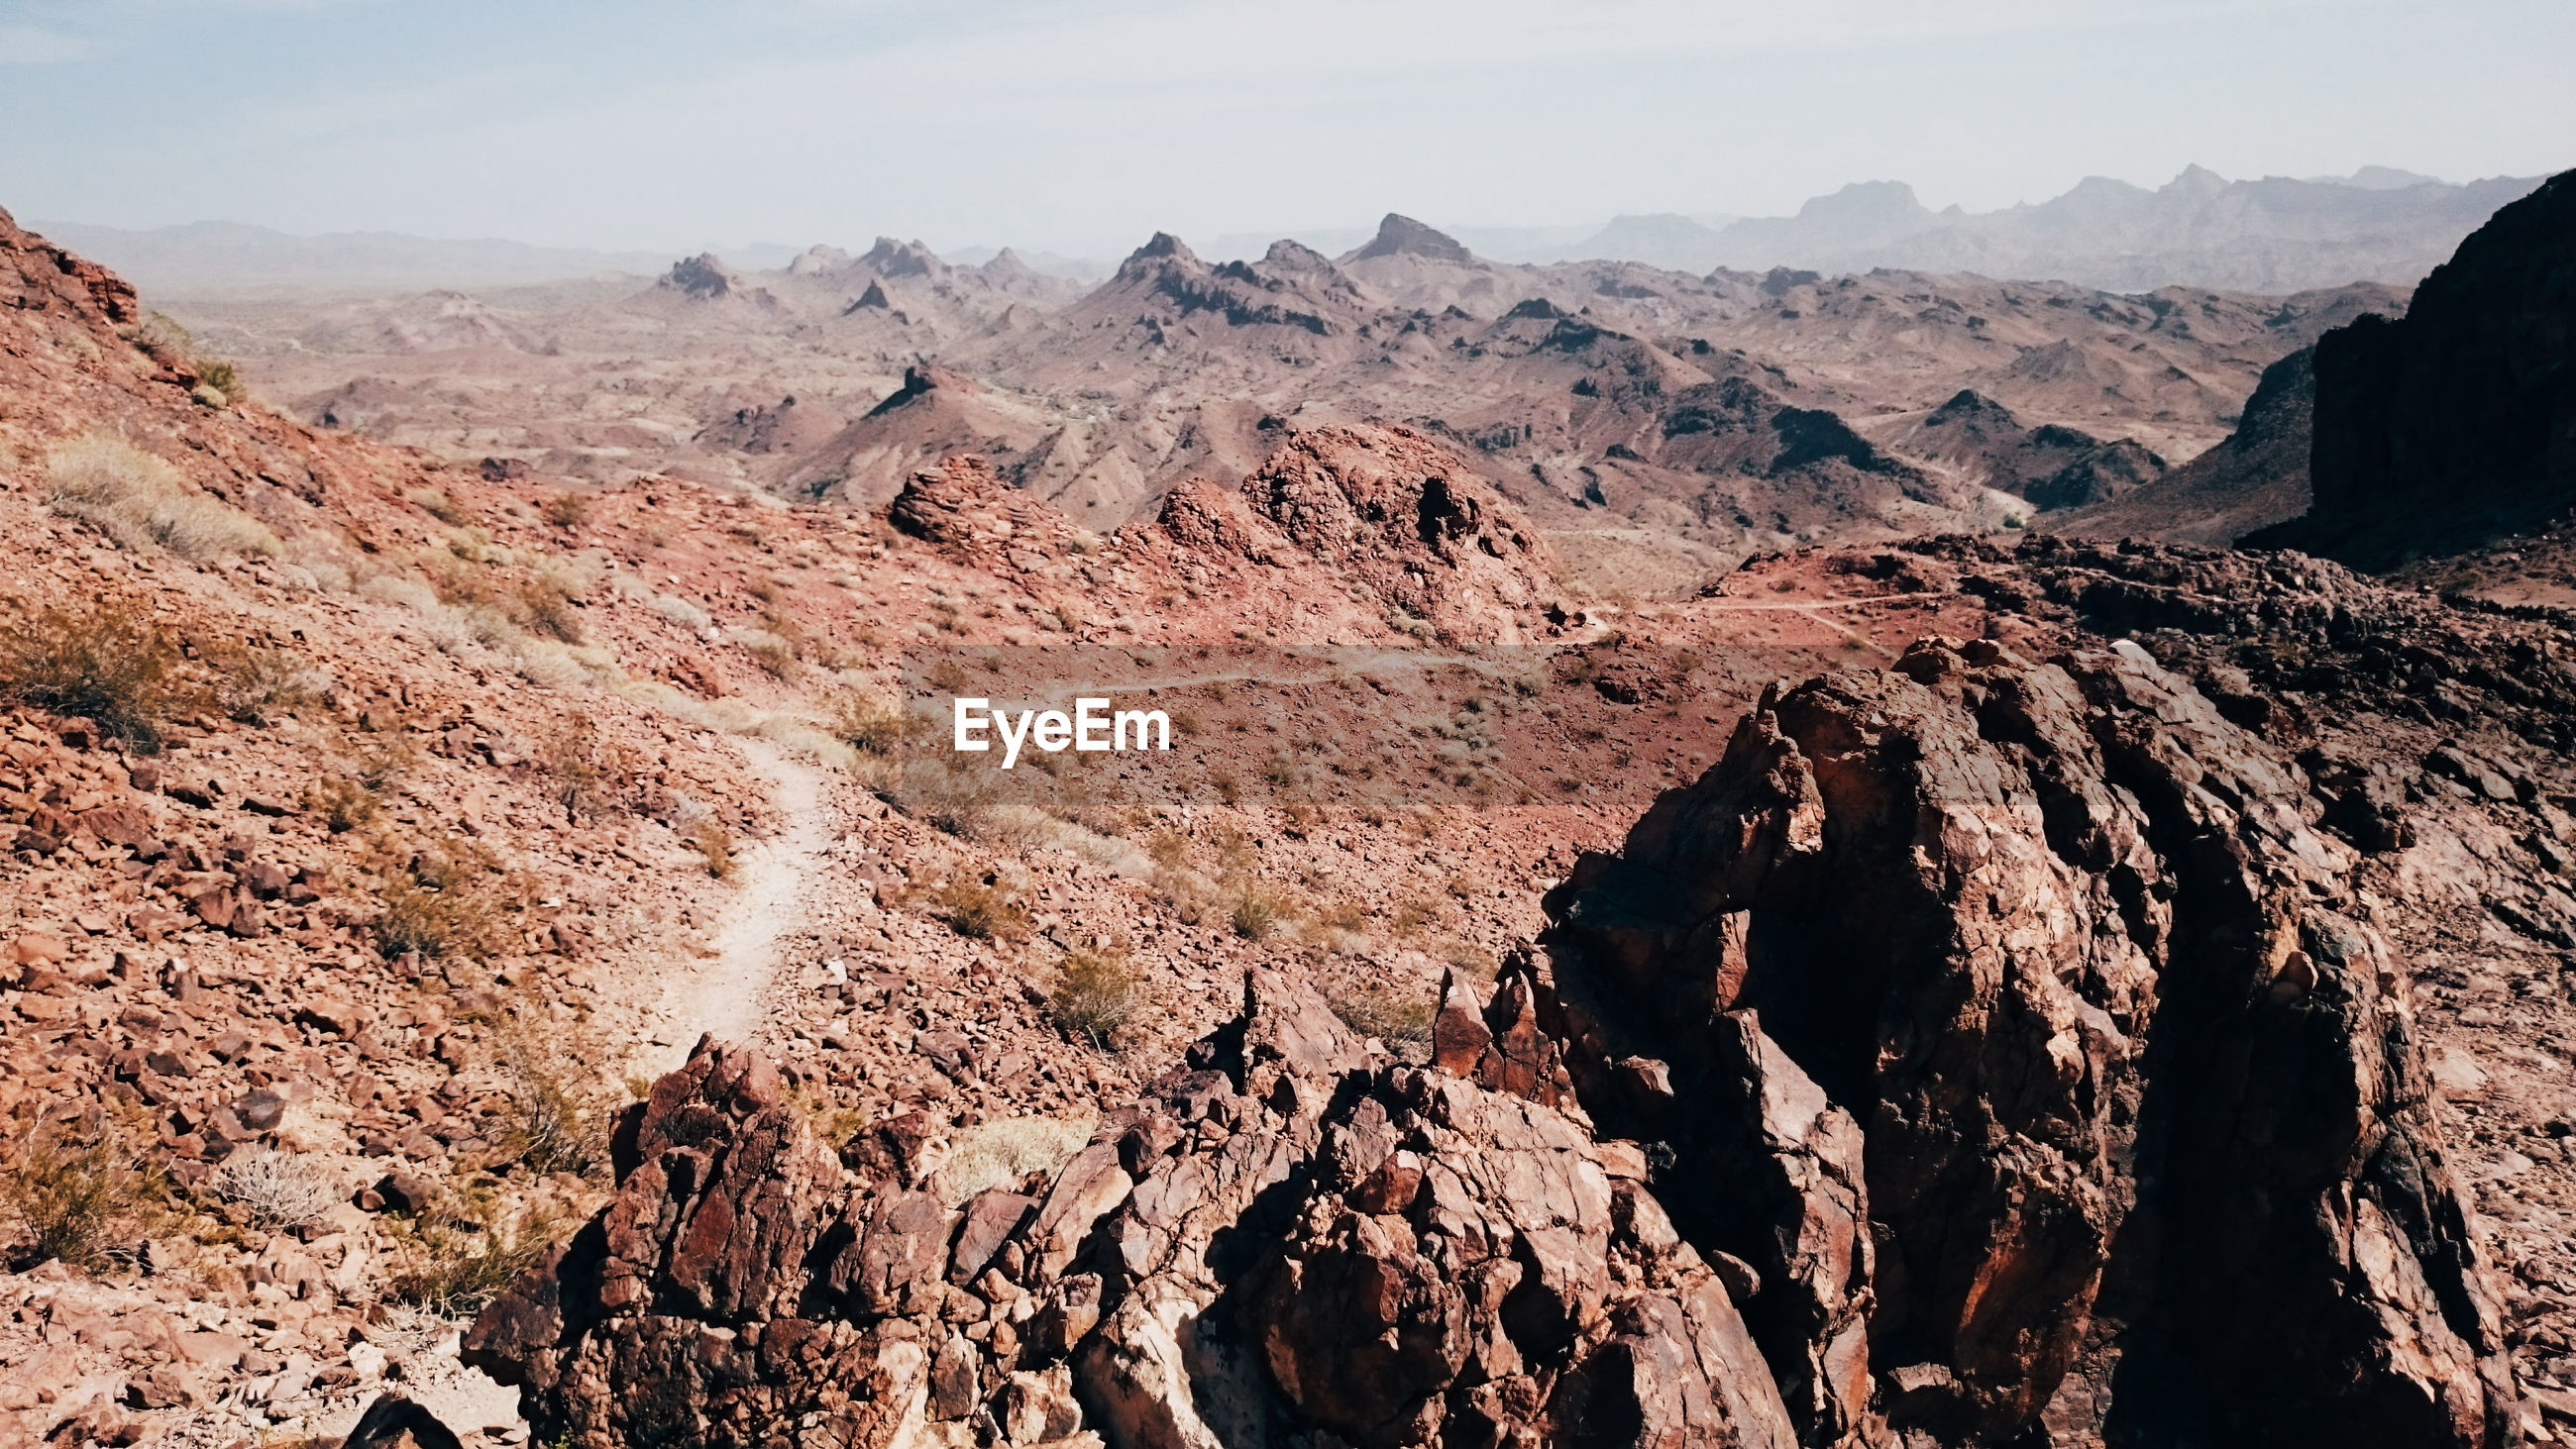 Scenic view of rocky landscape